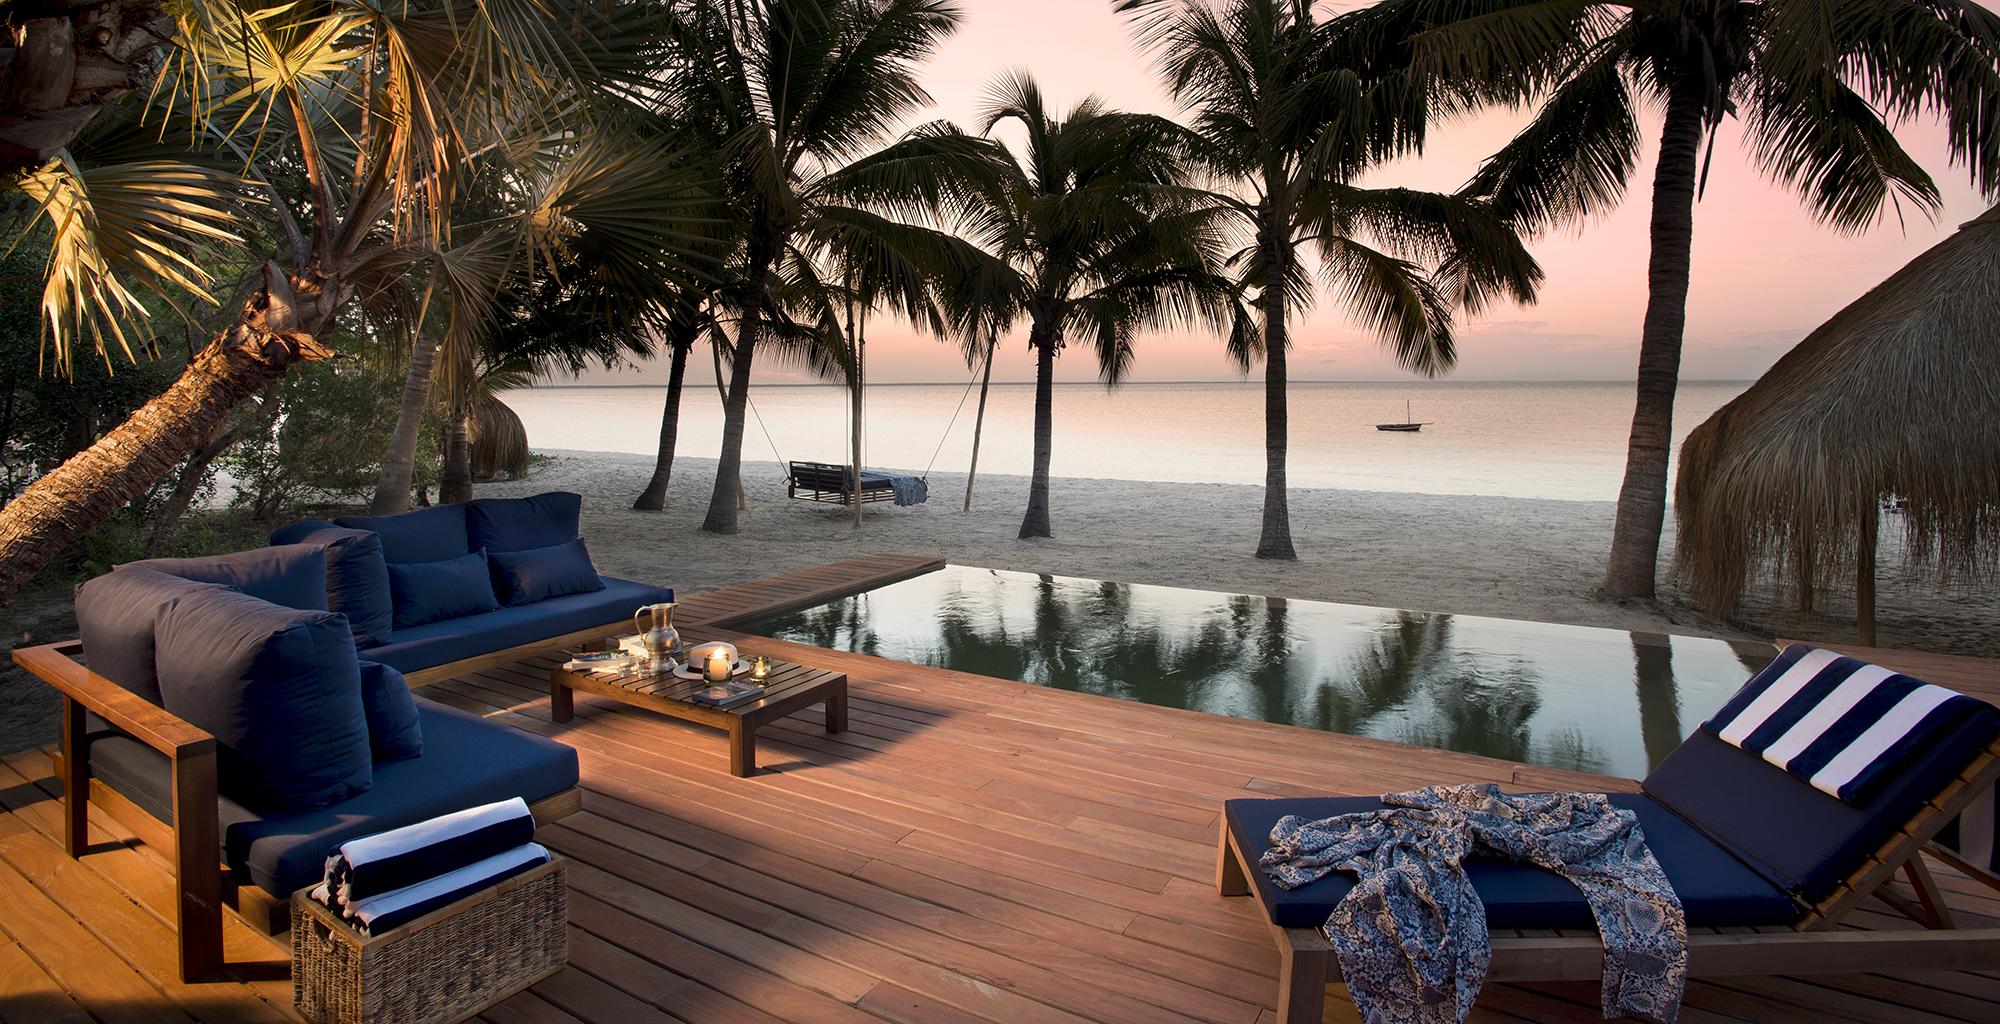 Mozambique-Bazaruto-Archipelago-Benguerra-Island-Lodge-Deck-Swimming-Pool